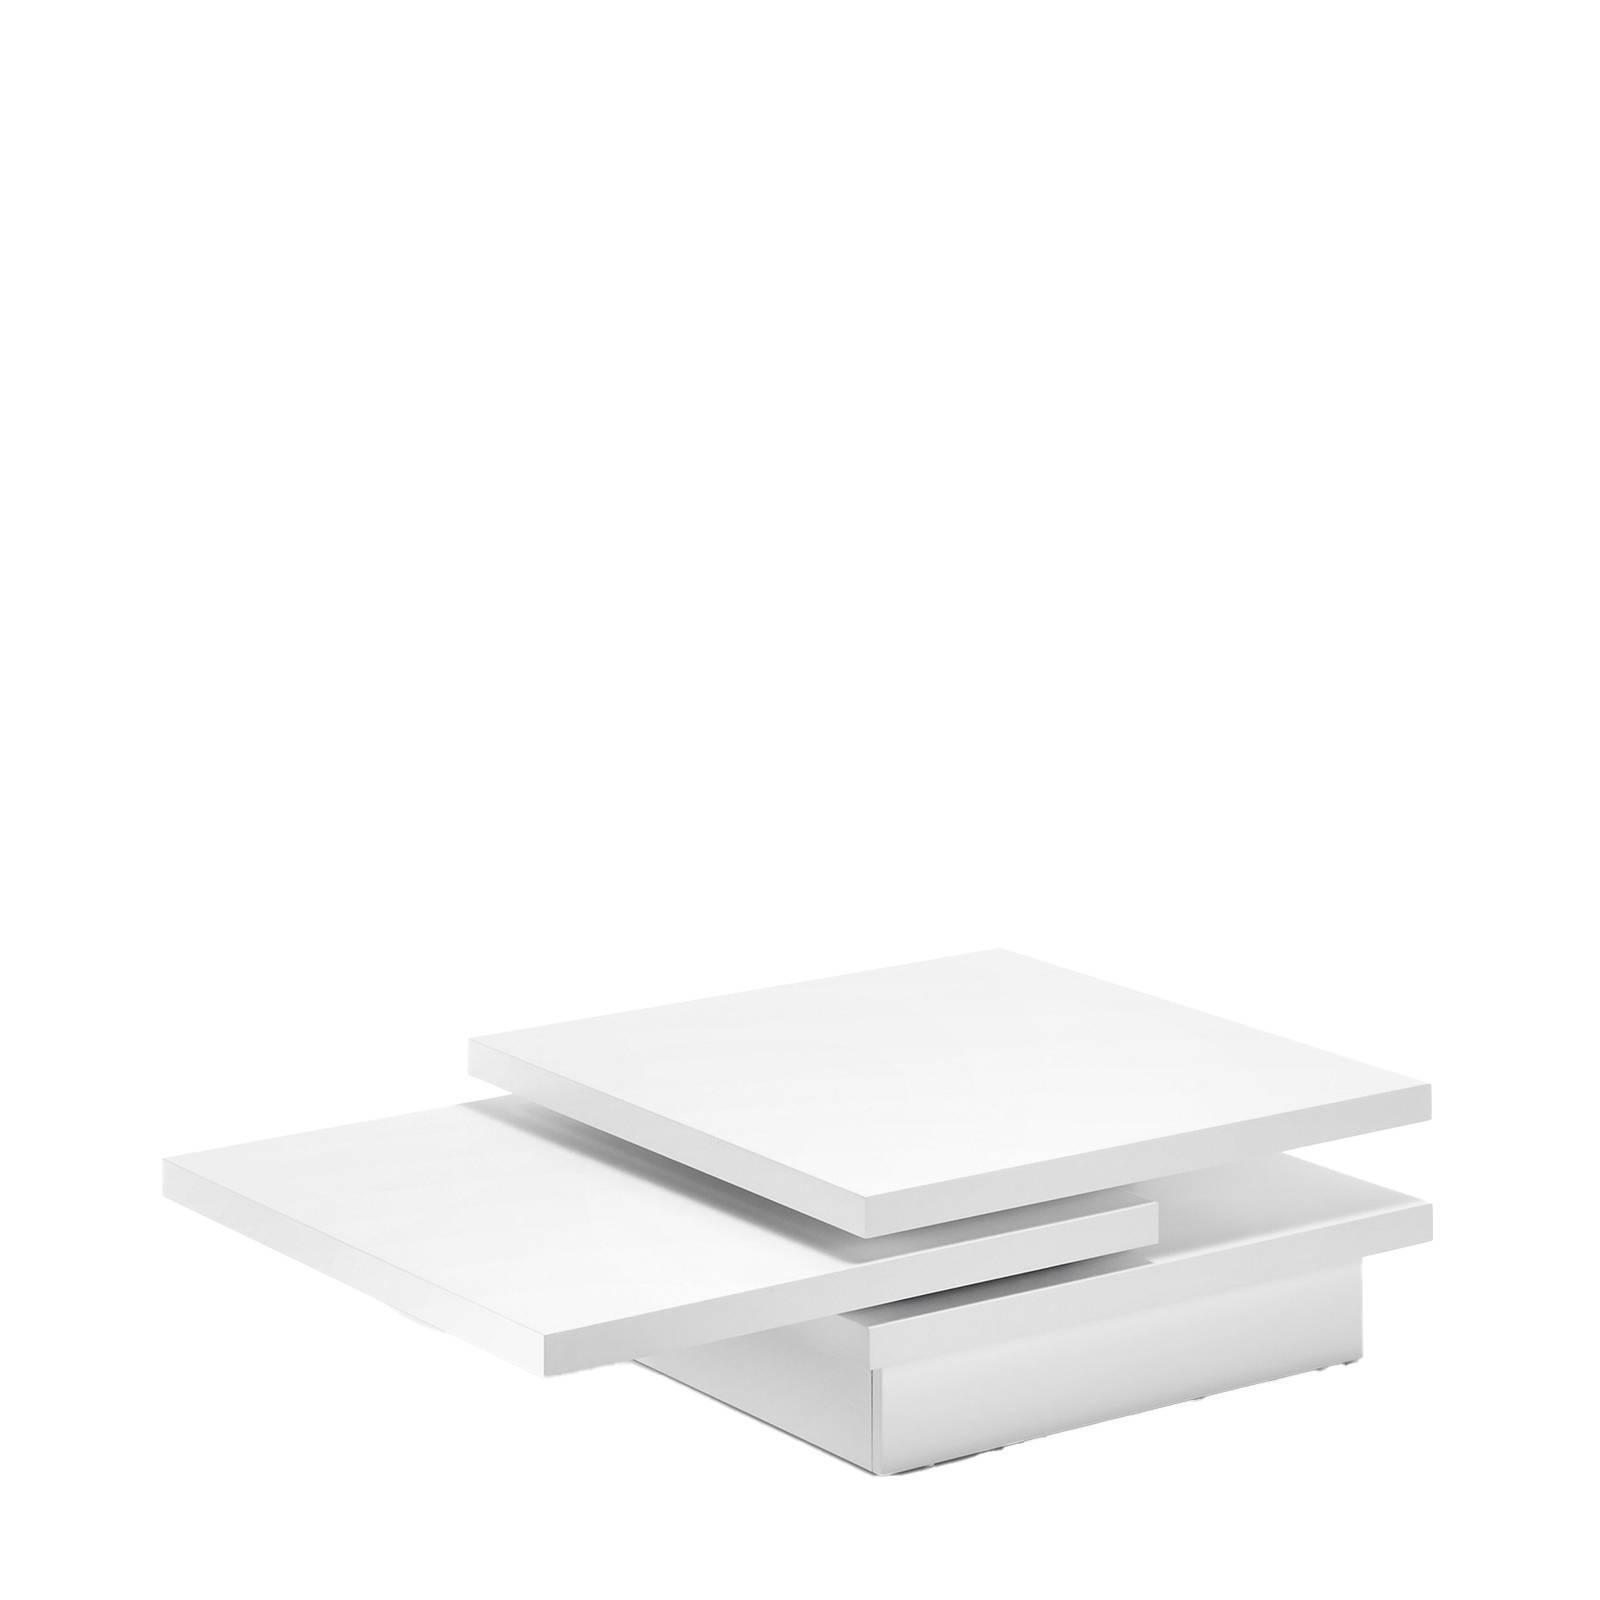 Salontafel Wit Blok.Salontafels Bij Wehkamp Gratis Bezorging Vanaf 20